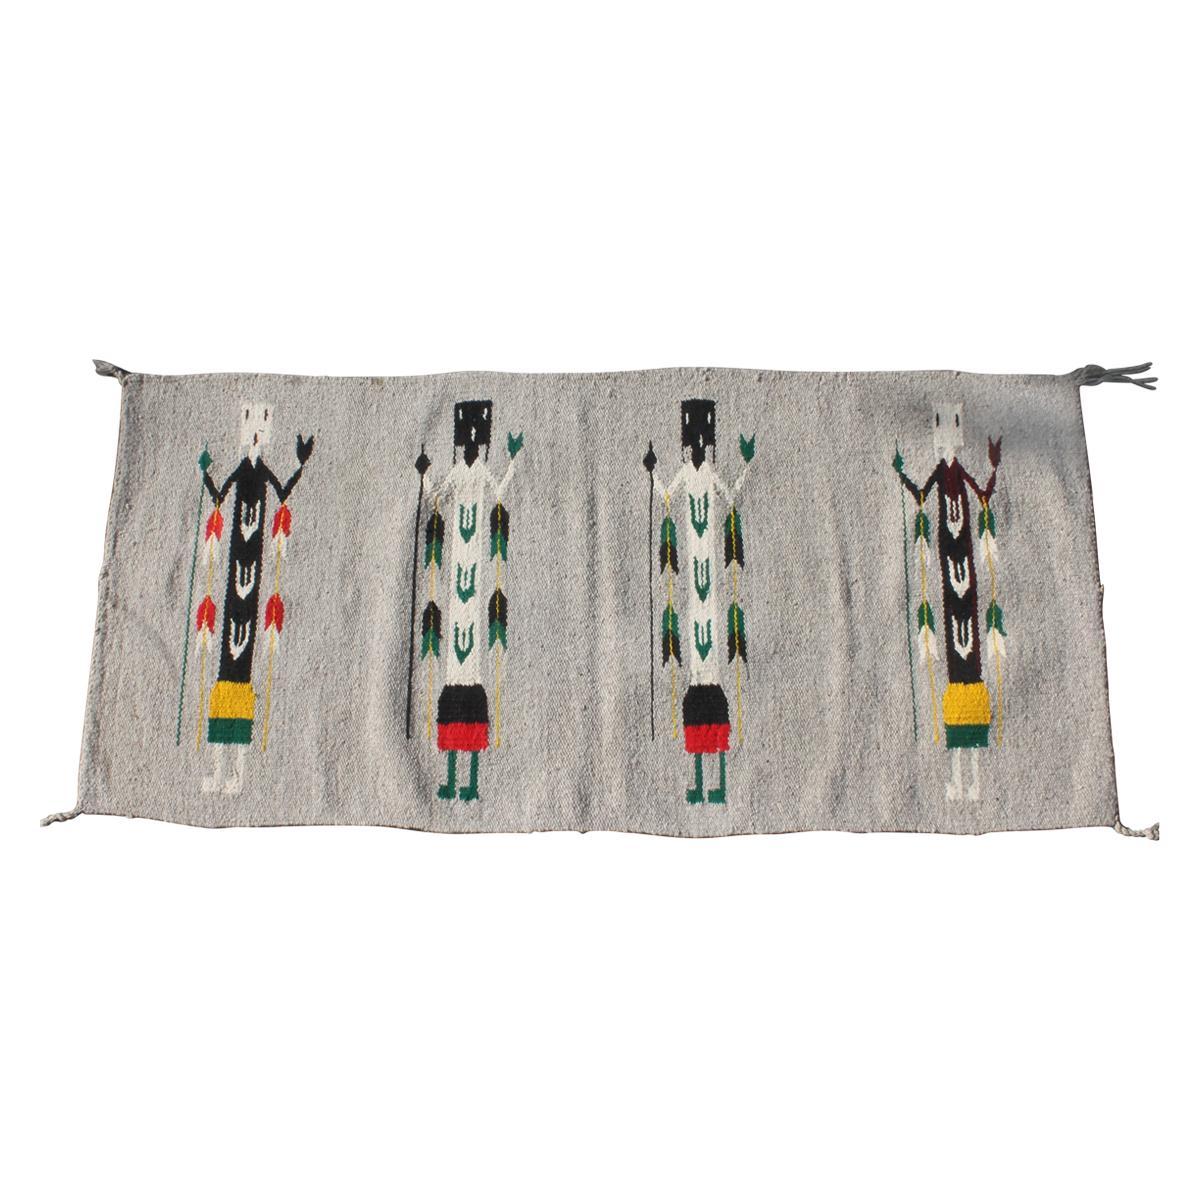 Yei Navajo Indian Weaving